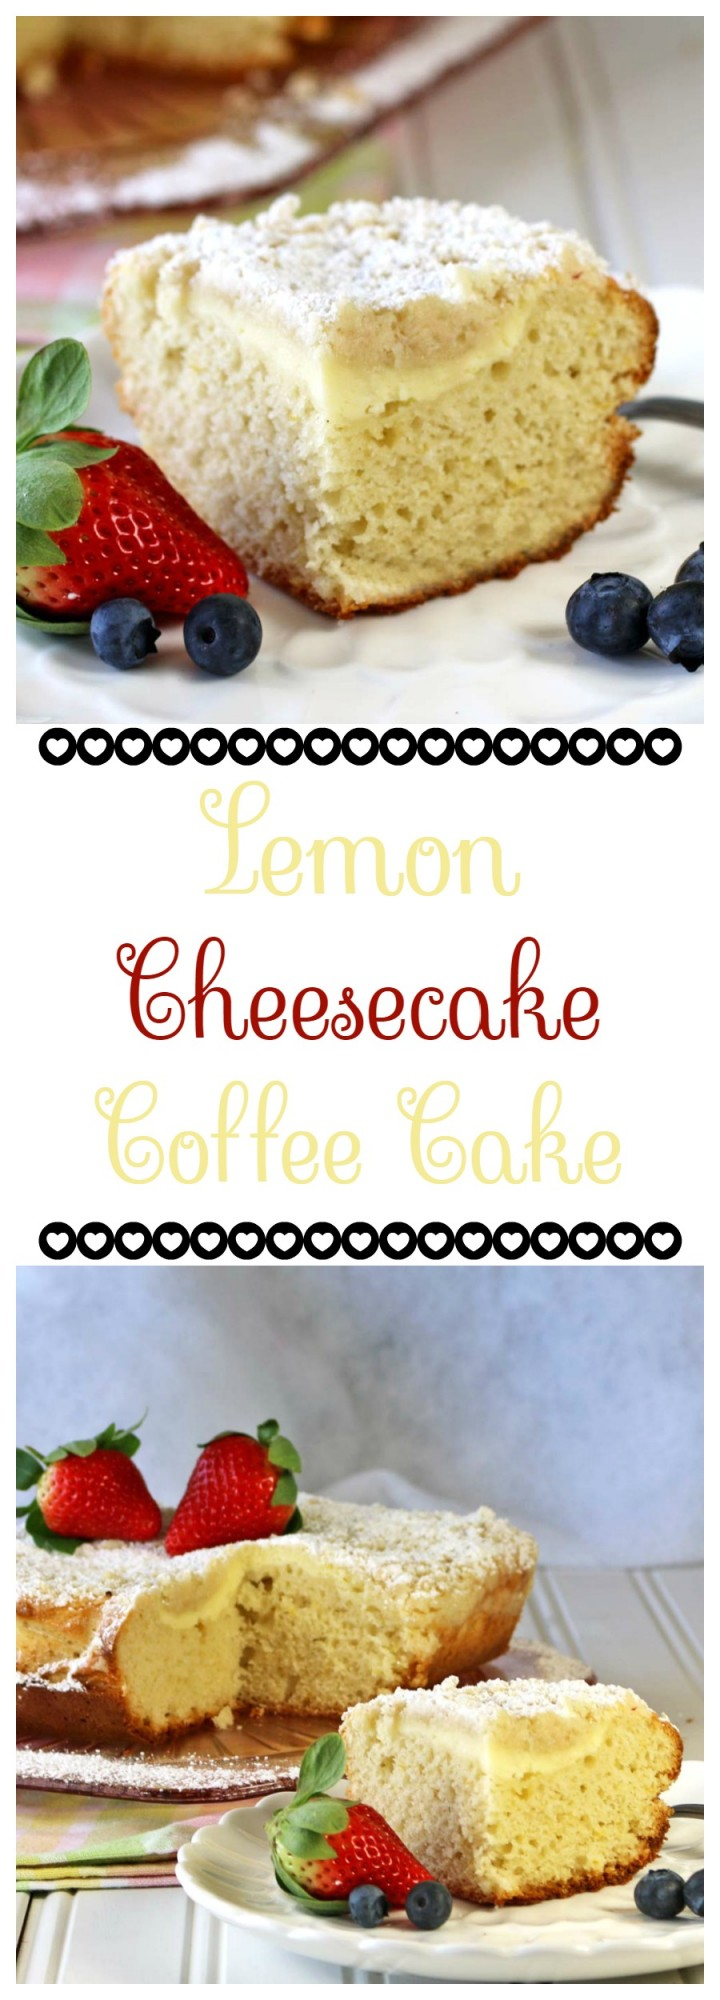 lemon-cheesecake-coffee-cake